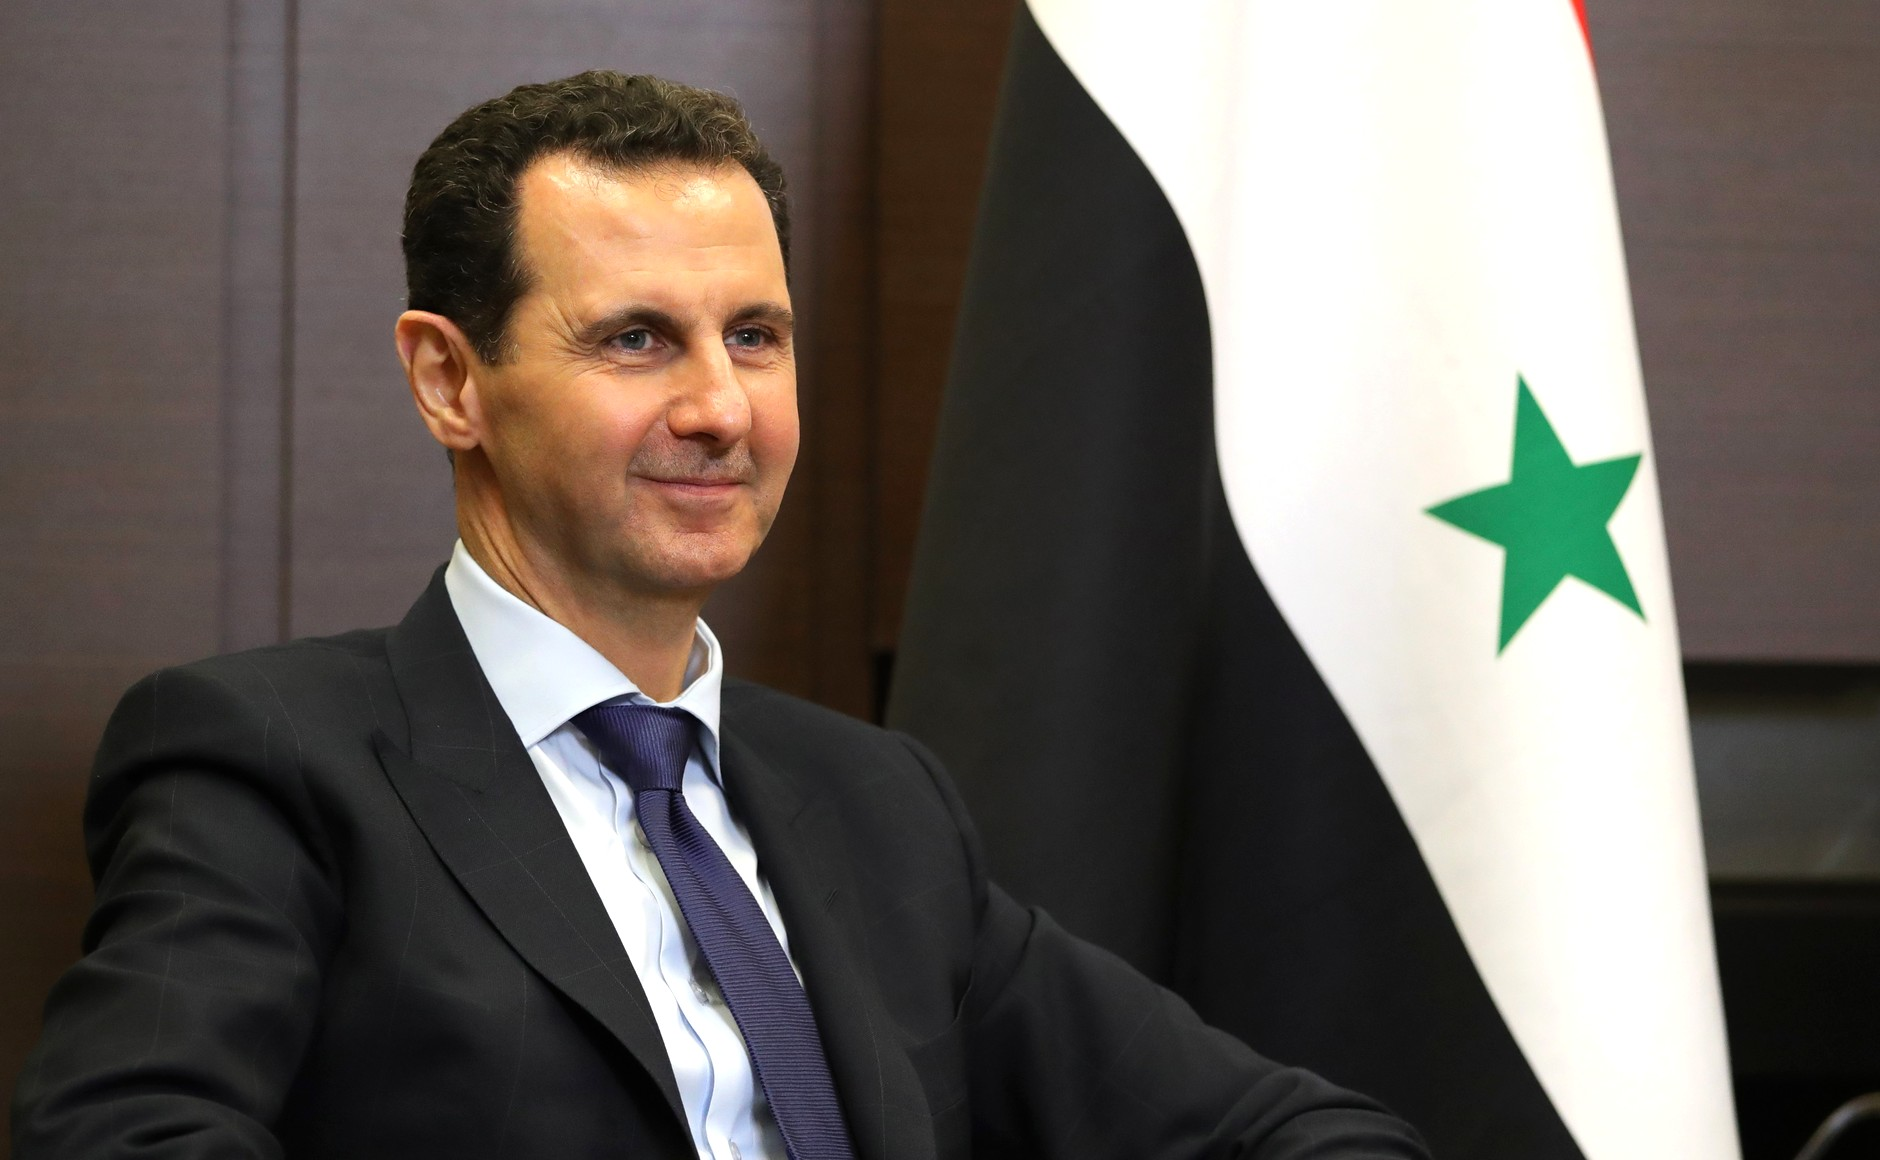 Moscow, Russia, May 17th 2018. PICTURED:  Syrian President Bashar al-Assad at the Kremlin  photo credit www.kremlin.ru